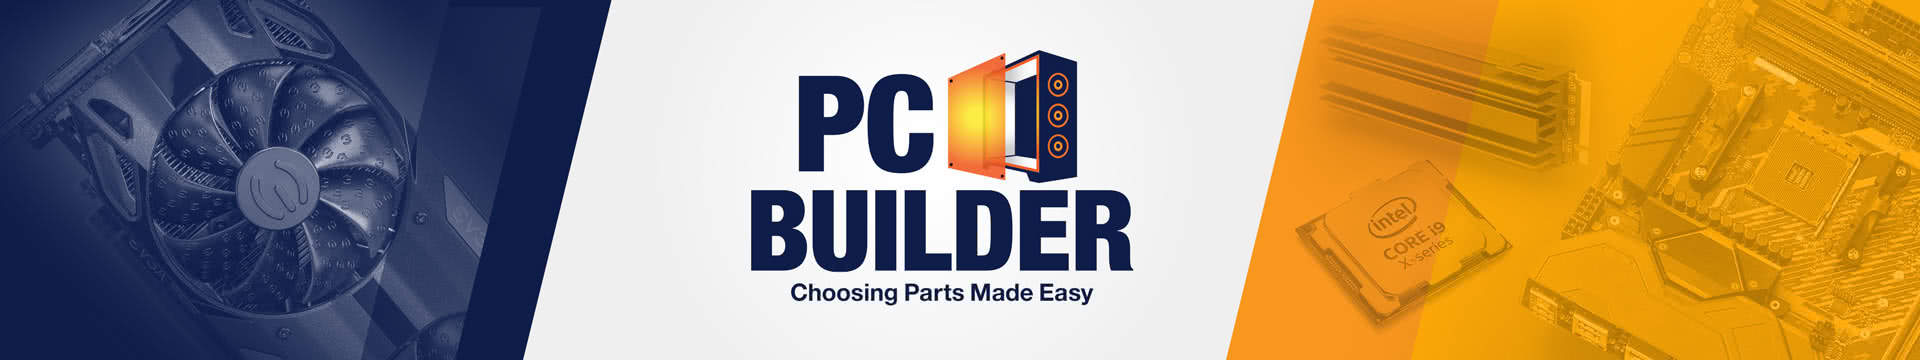 Newegg PC Builder